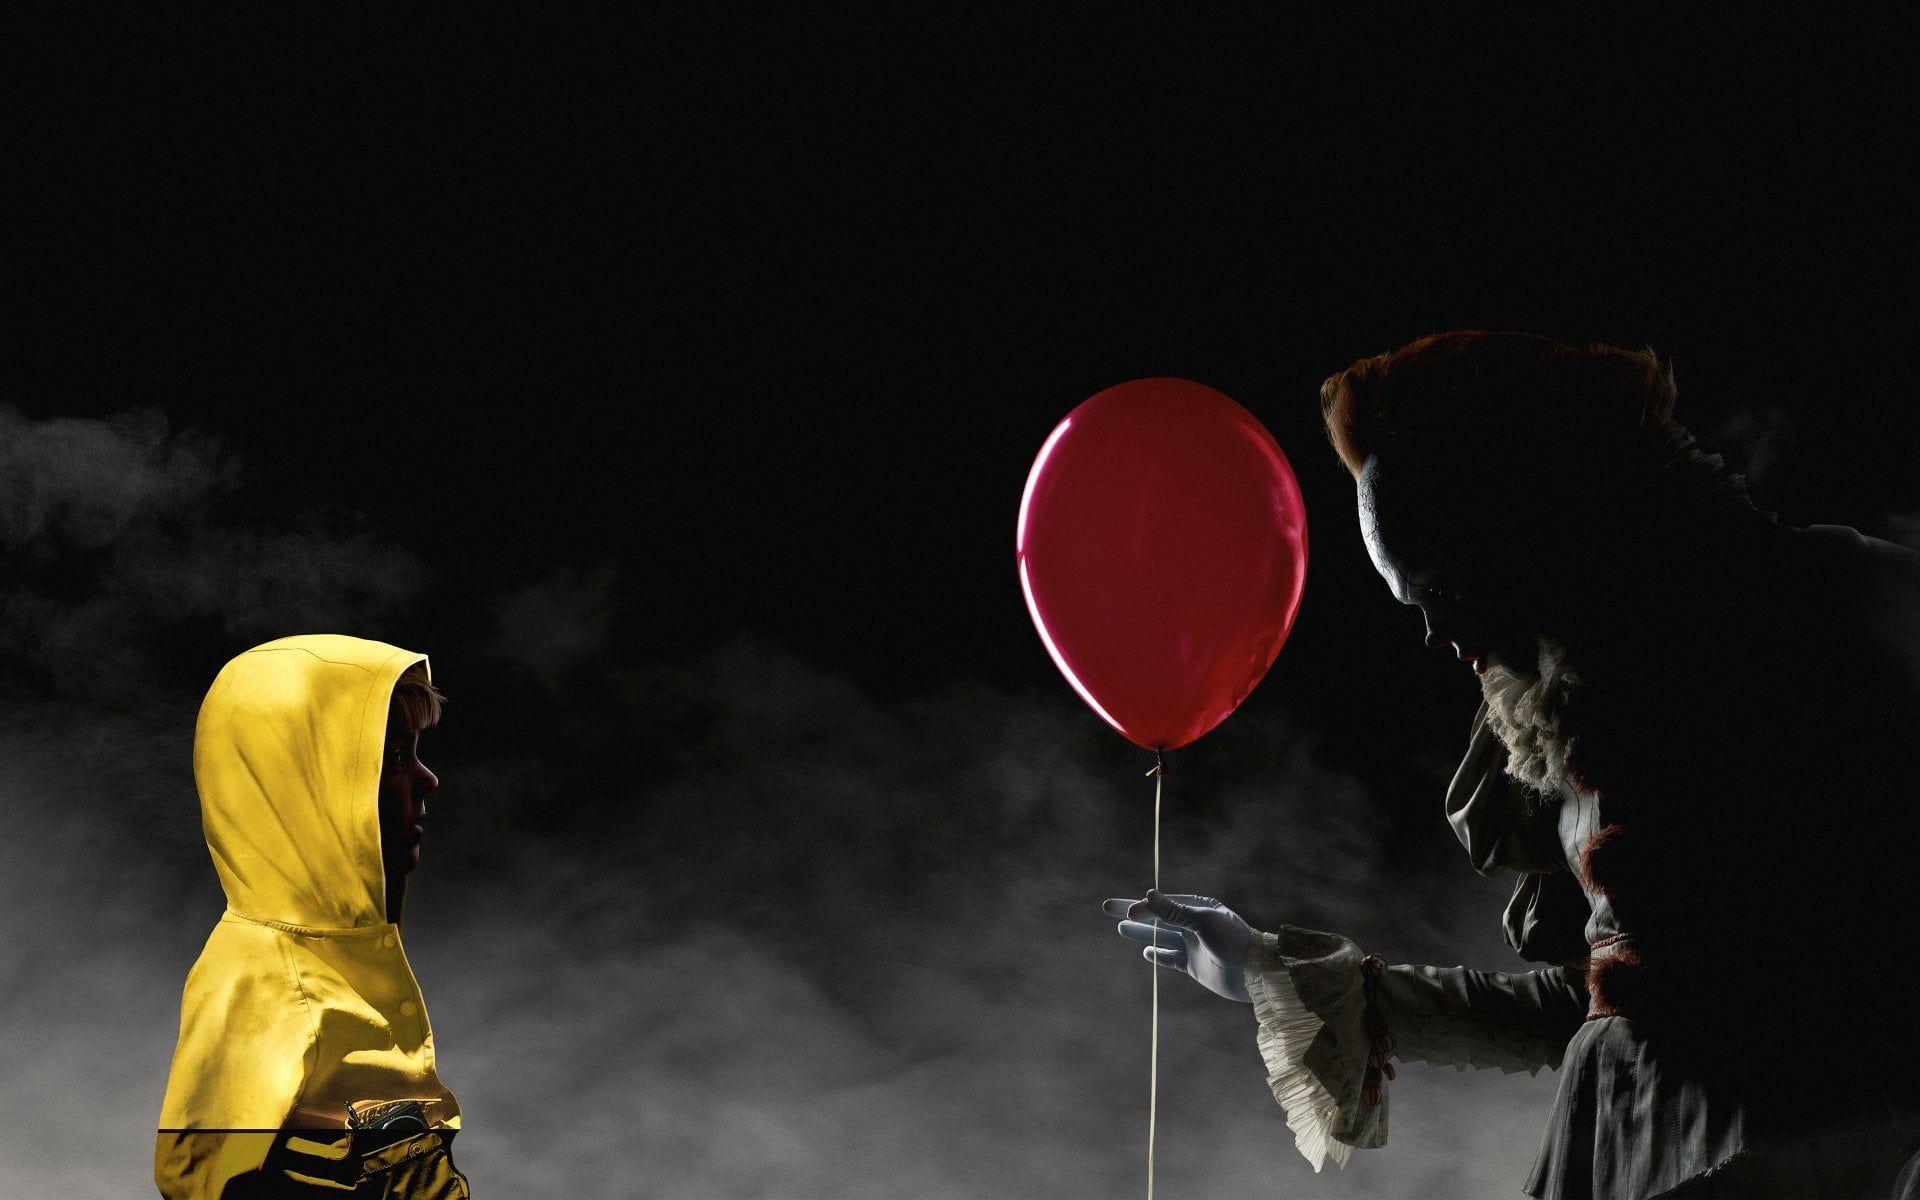 Ballon Film Download